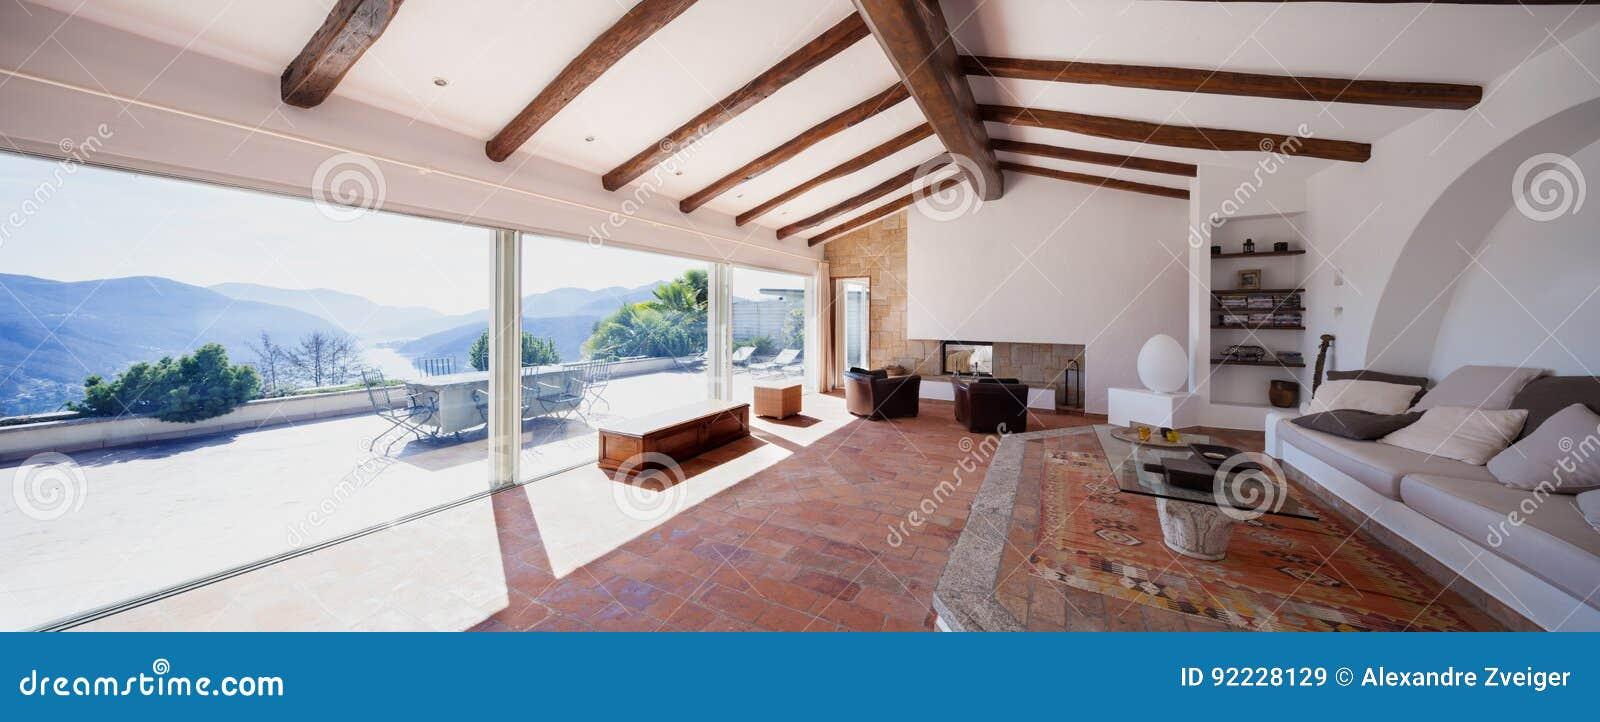 Furnish Living Room With Beautiful Timber Beams Stock Image - Image ...